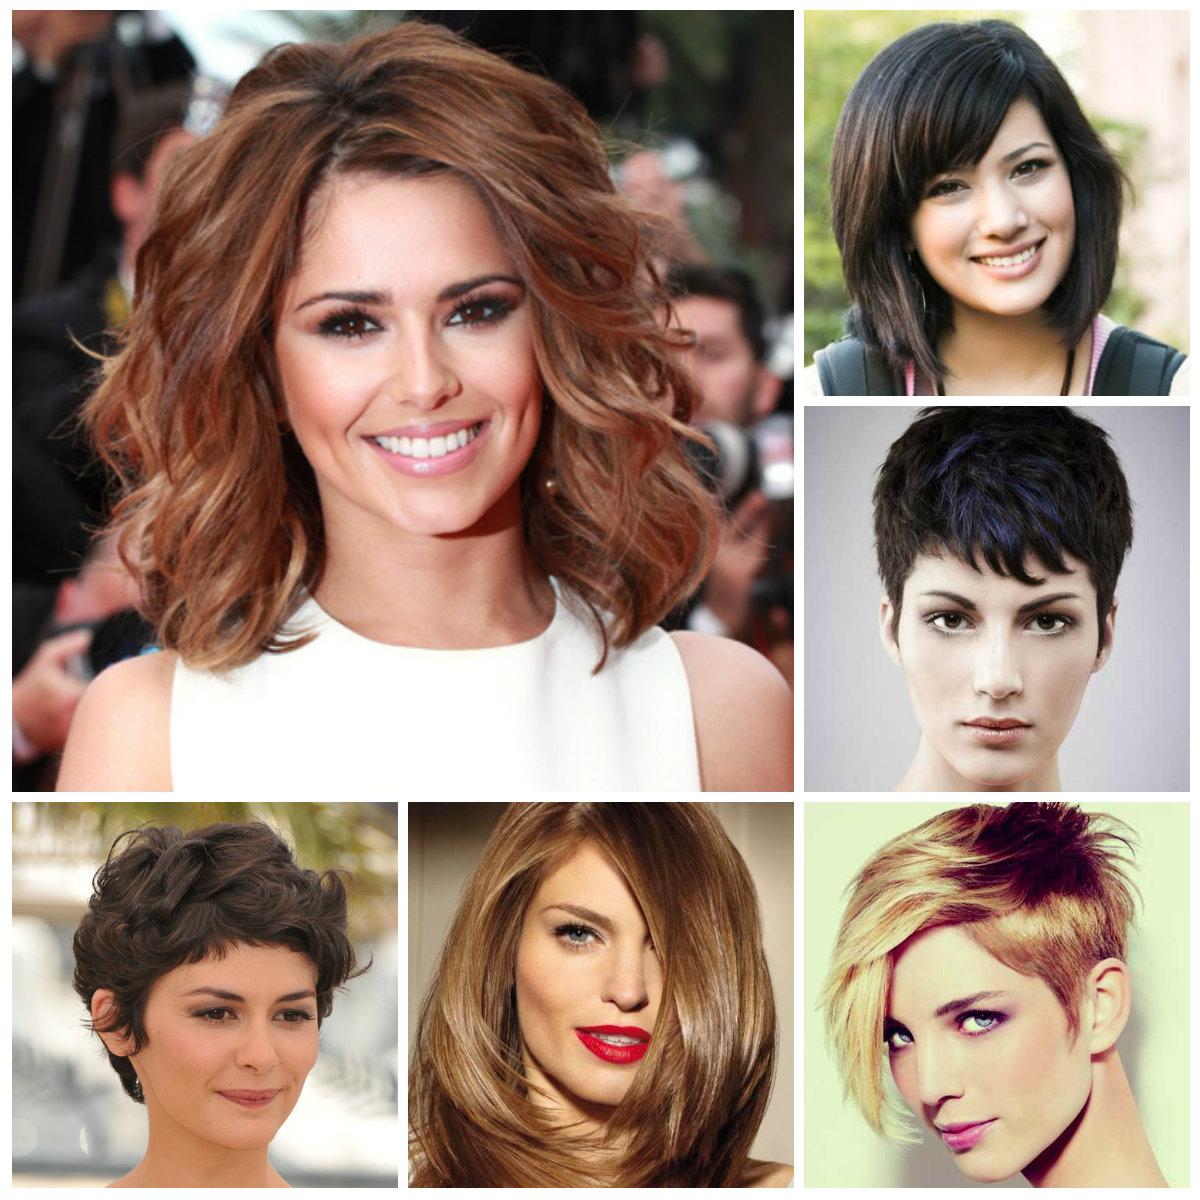 Medium And Short Haircuts For Thick Hair | Hairstyles For Women 2019 Pertaining To Short Haircuts For Voluminous Hair (View 2 of 25)